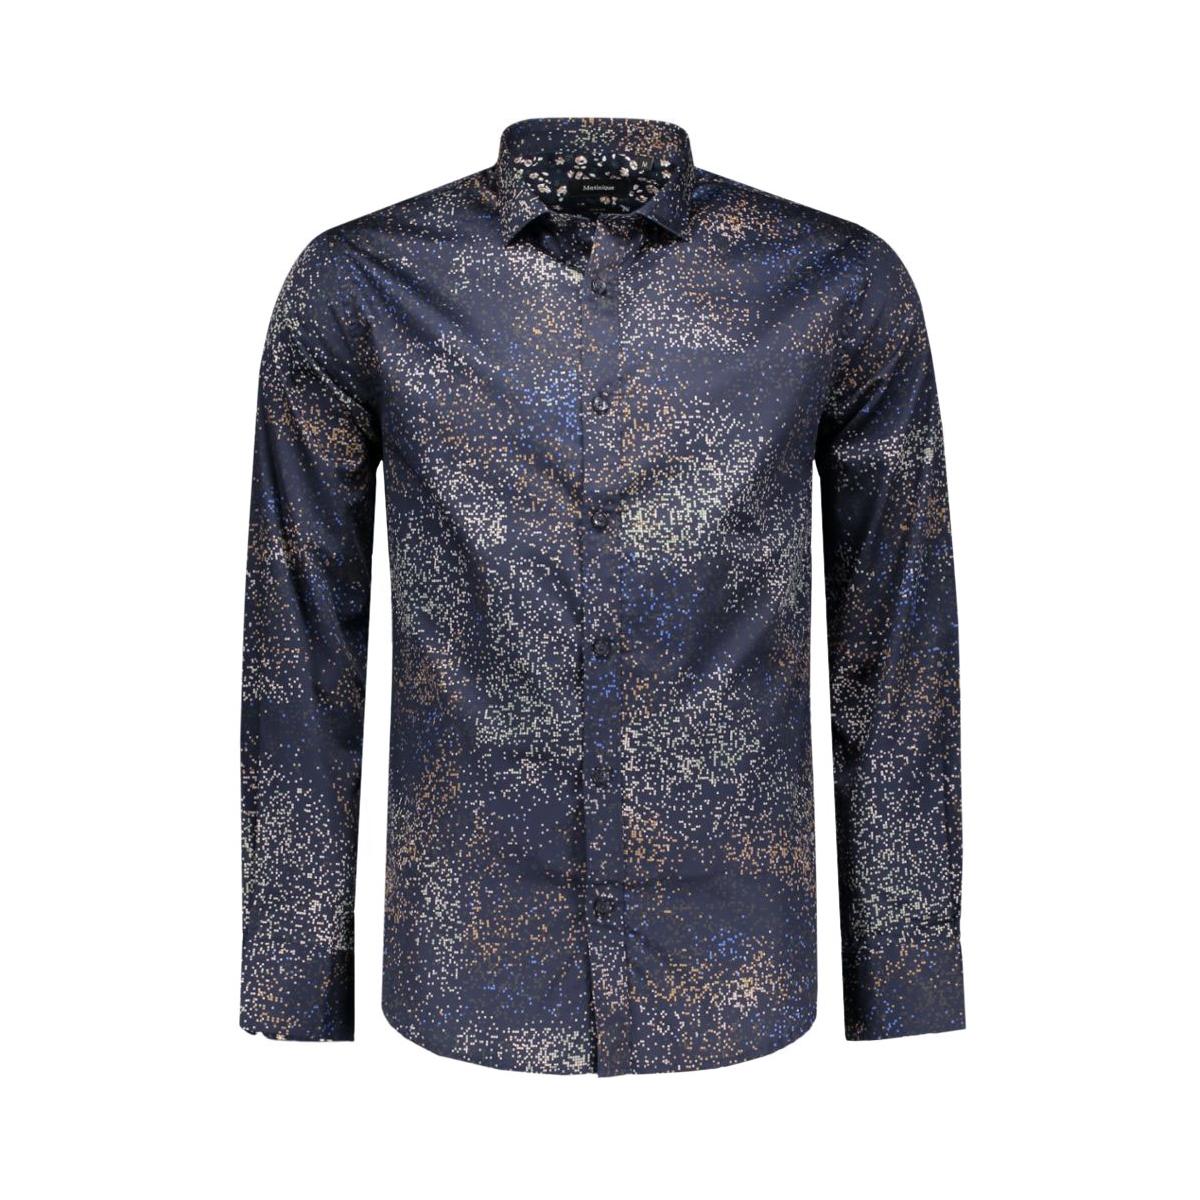 allan 30201177 matinique overhemd 20211